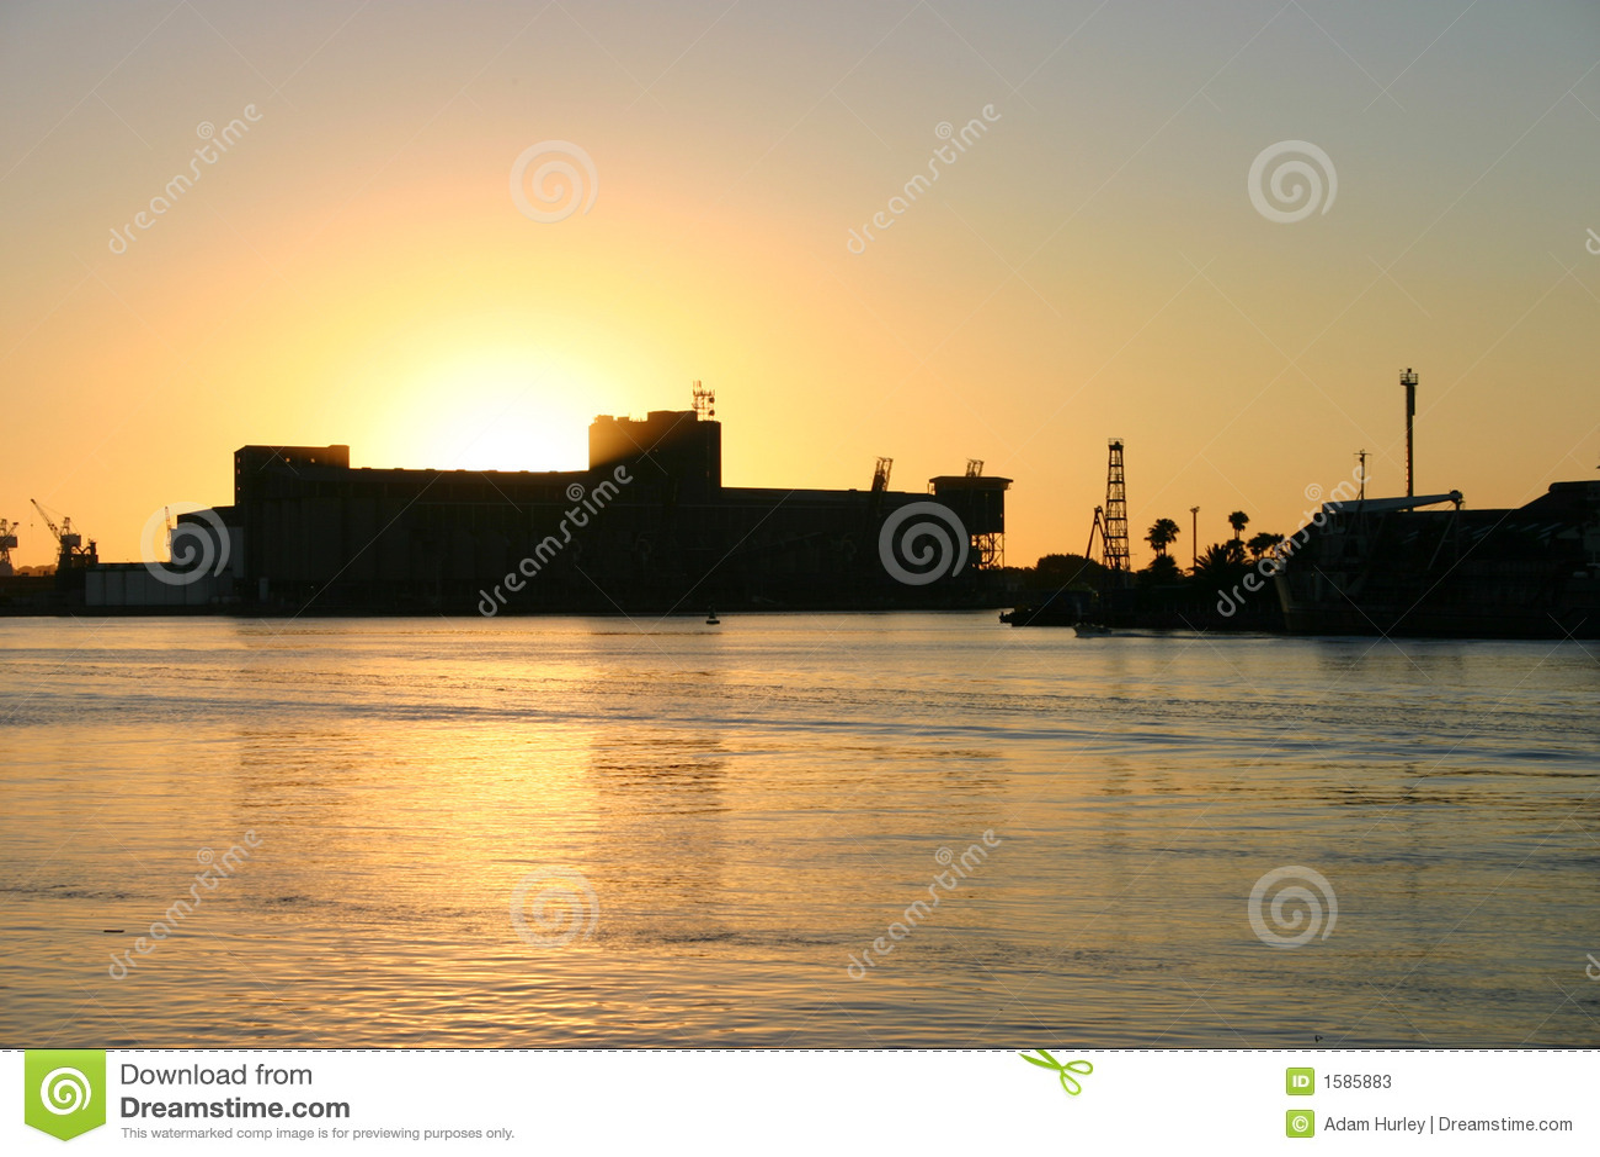 Newcaslte Harbour